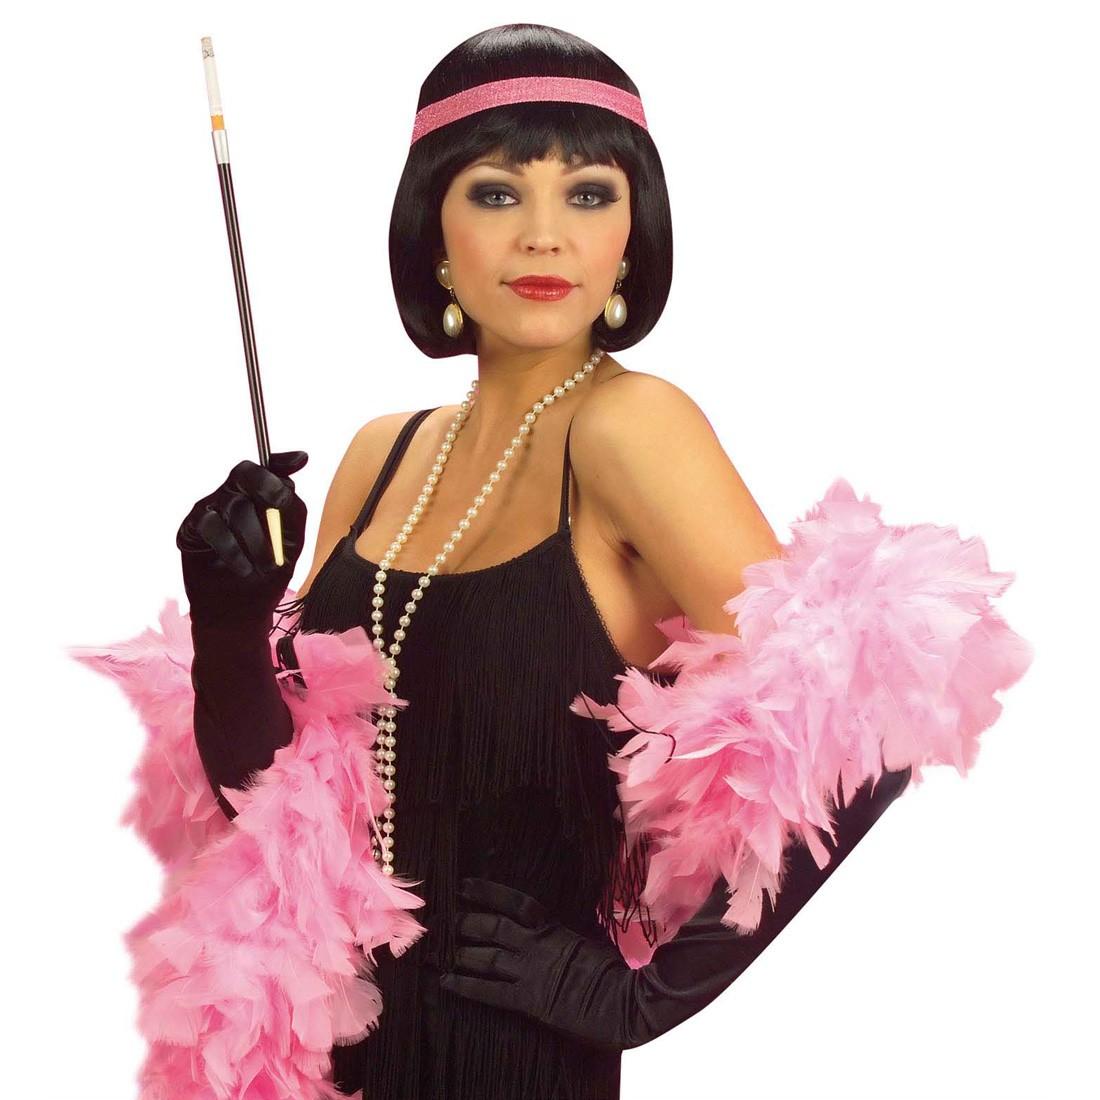 Damen faschingsper cke schwarz charleston per cke karnevalsper cke 14 99 - Schwarze jeansjacke damen ...